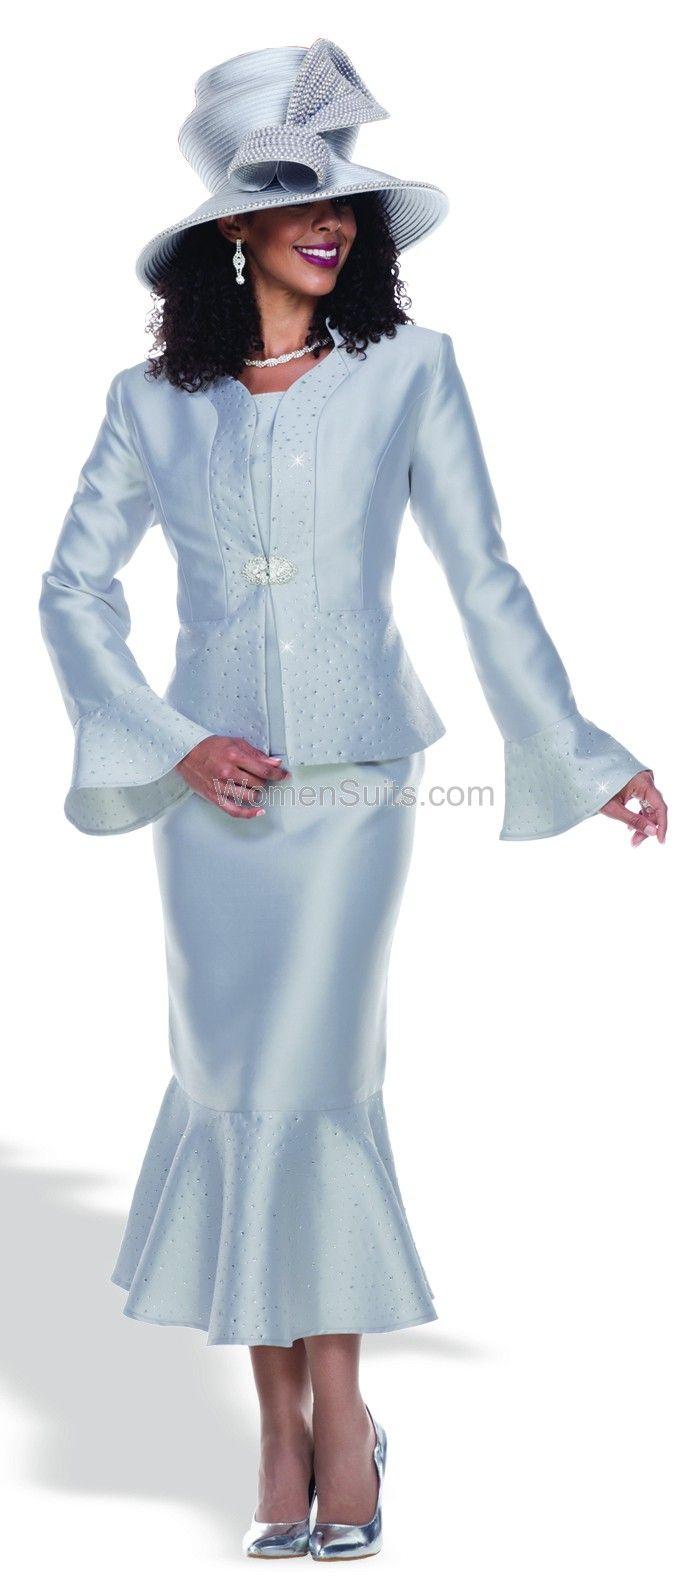 3 Pc Jacket Cami Skirt Set 3298 S Lisa Rene Designers